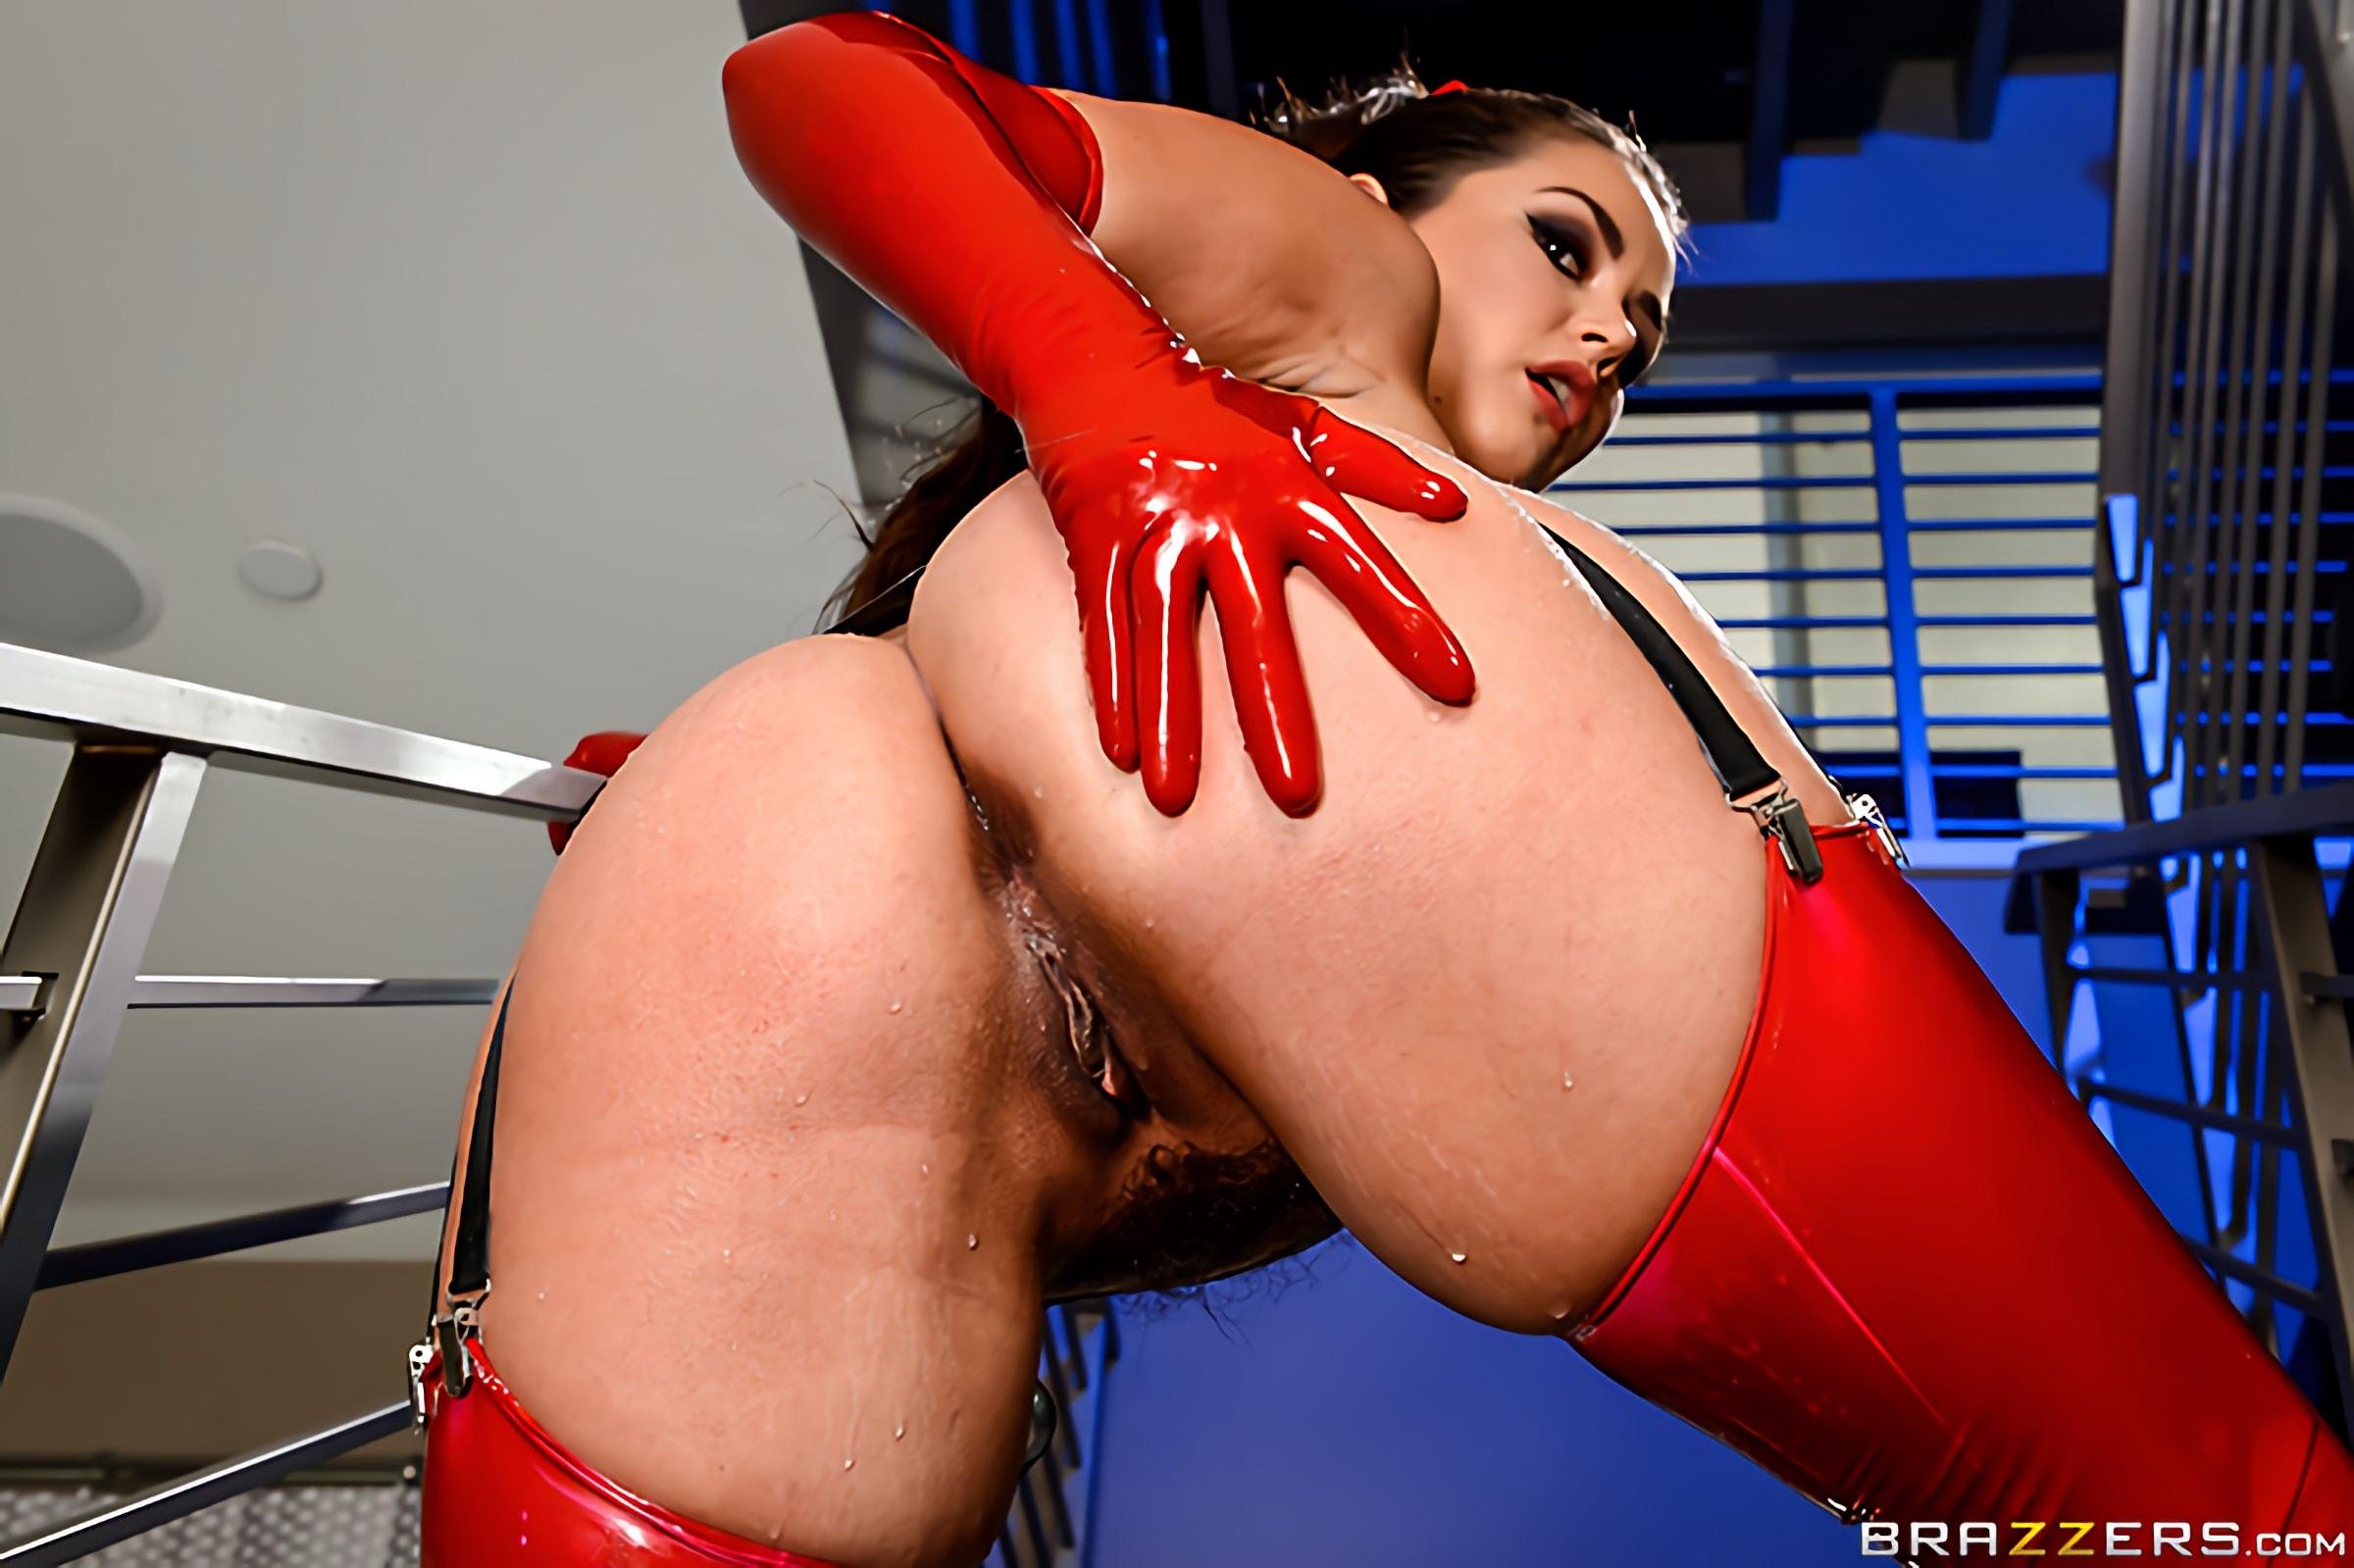 Brazzers 'Latex Lust' starring Allie Haze (Photo 8)